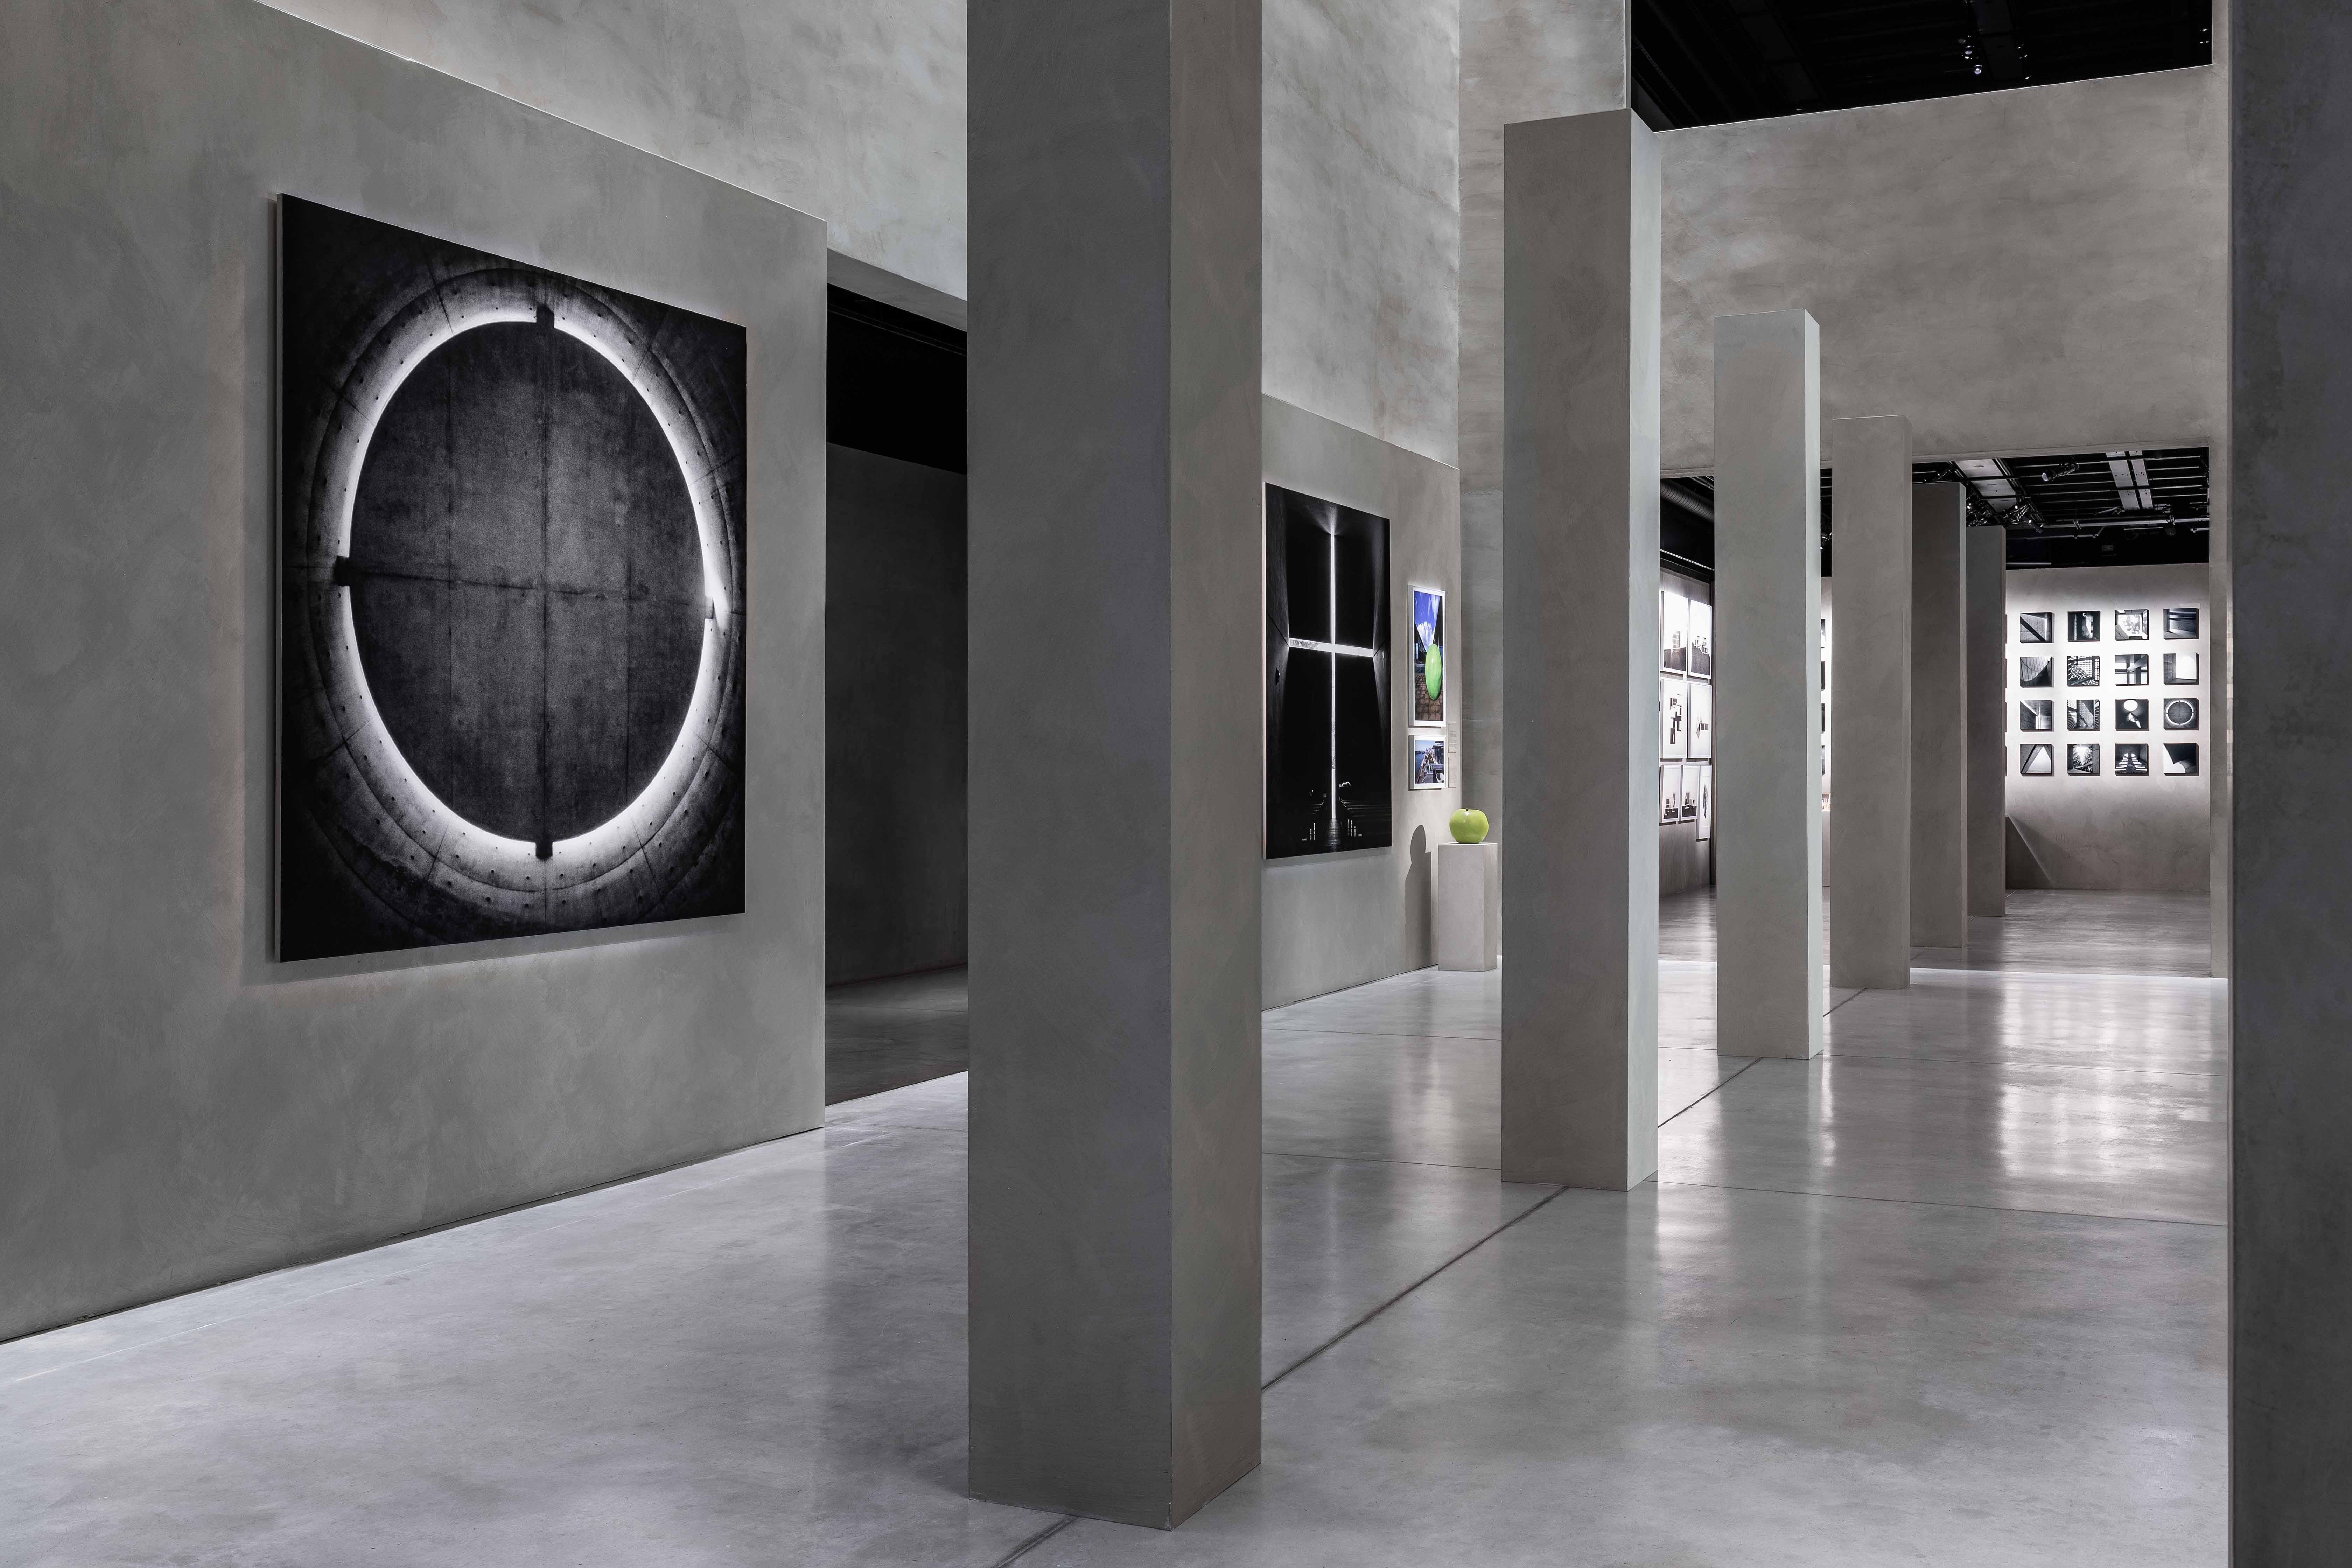 Why Giorgio Armani loves 'unmistakable aesthetic style' of Japanese architect Tadao Ando